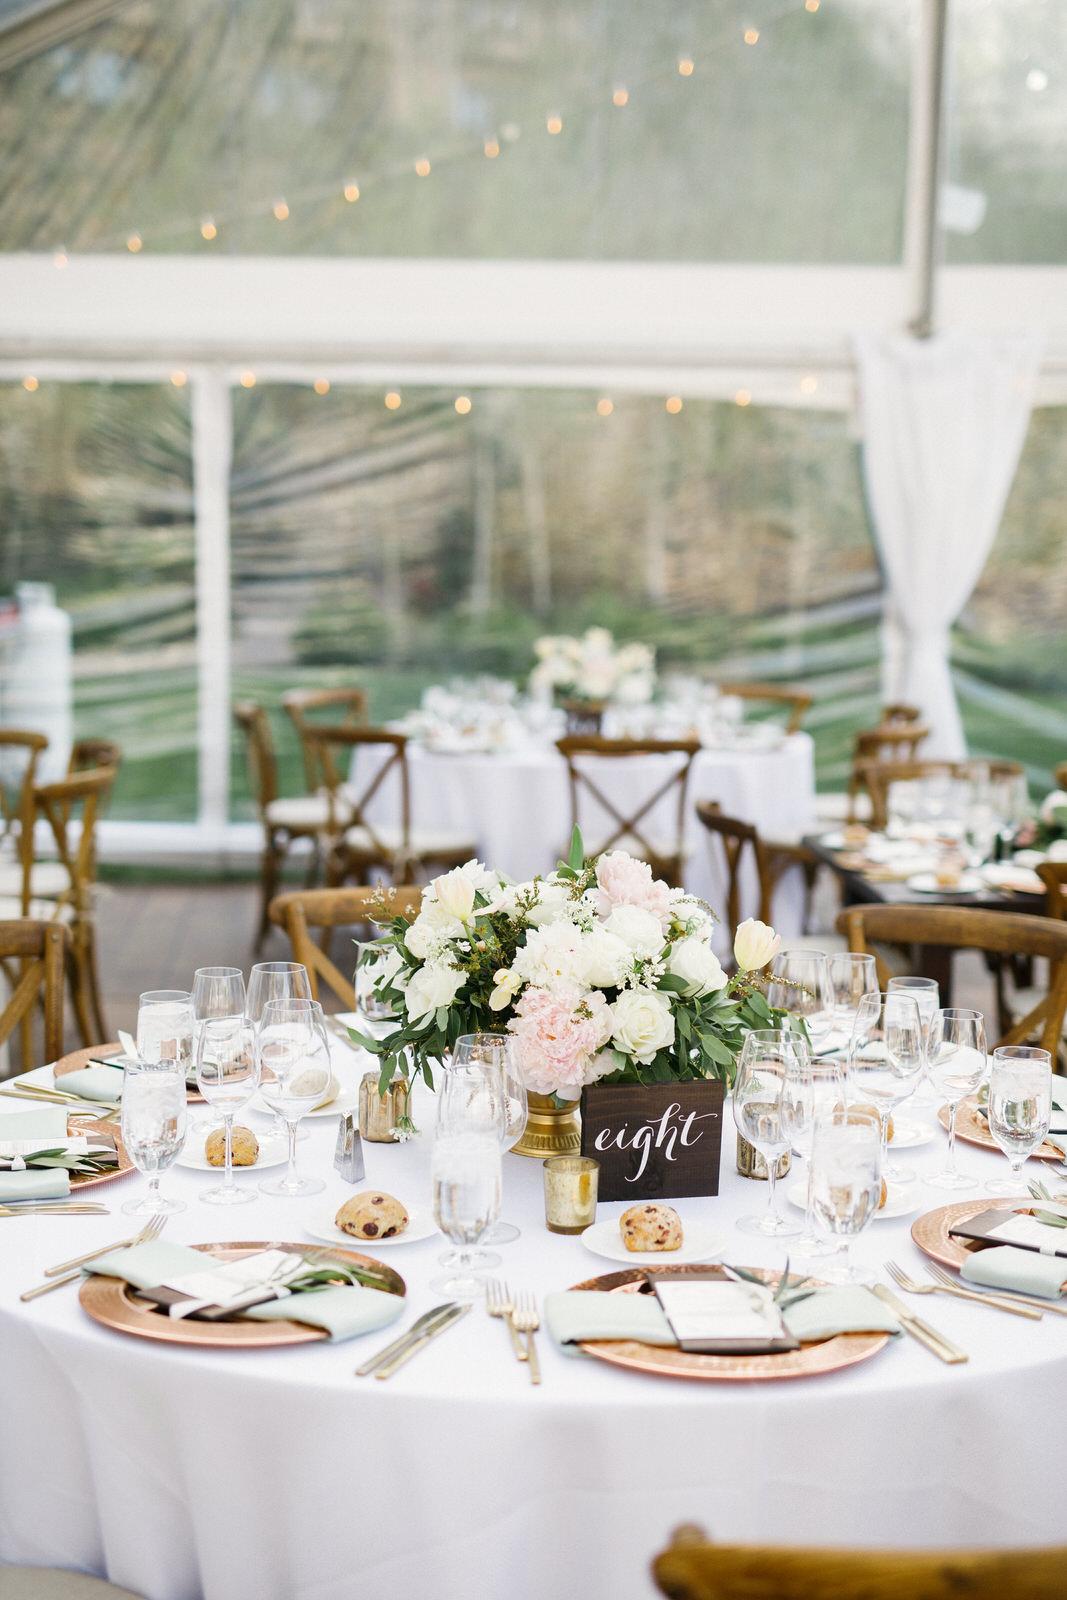 Montage Deer Valley Wedding | Summer Wedding | Neutral Wedding Decor | White Wedding Floral | Michelle Leo Events | Utah Event Planner and Designer | Gideon Photography